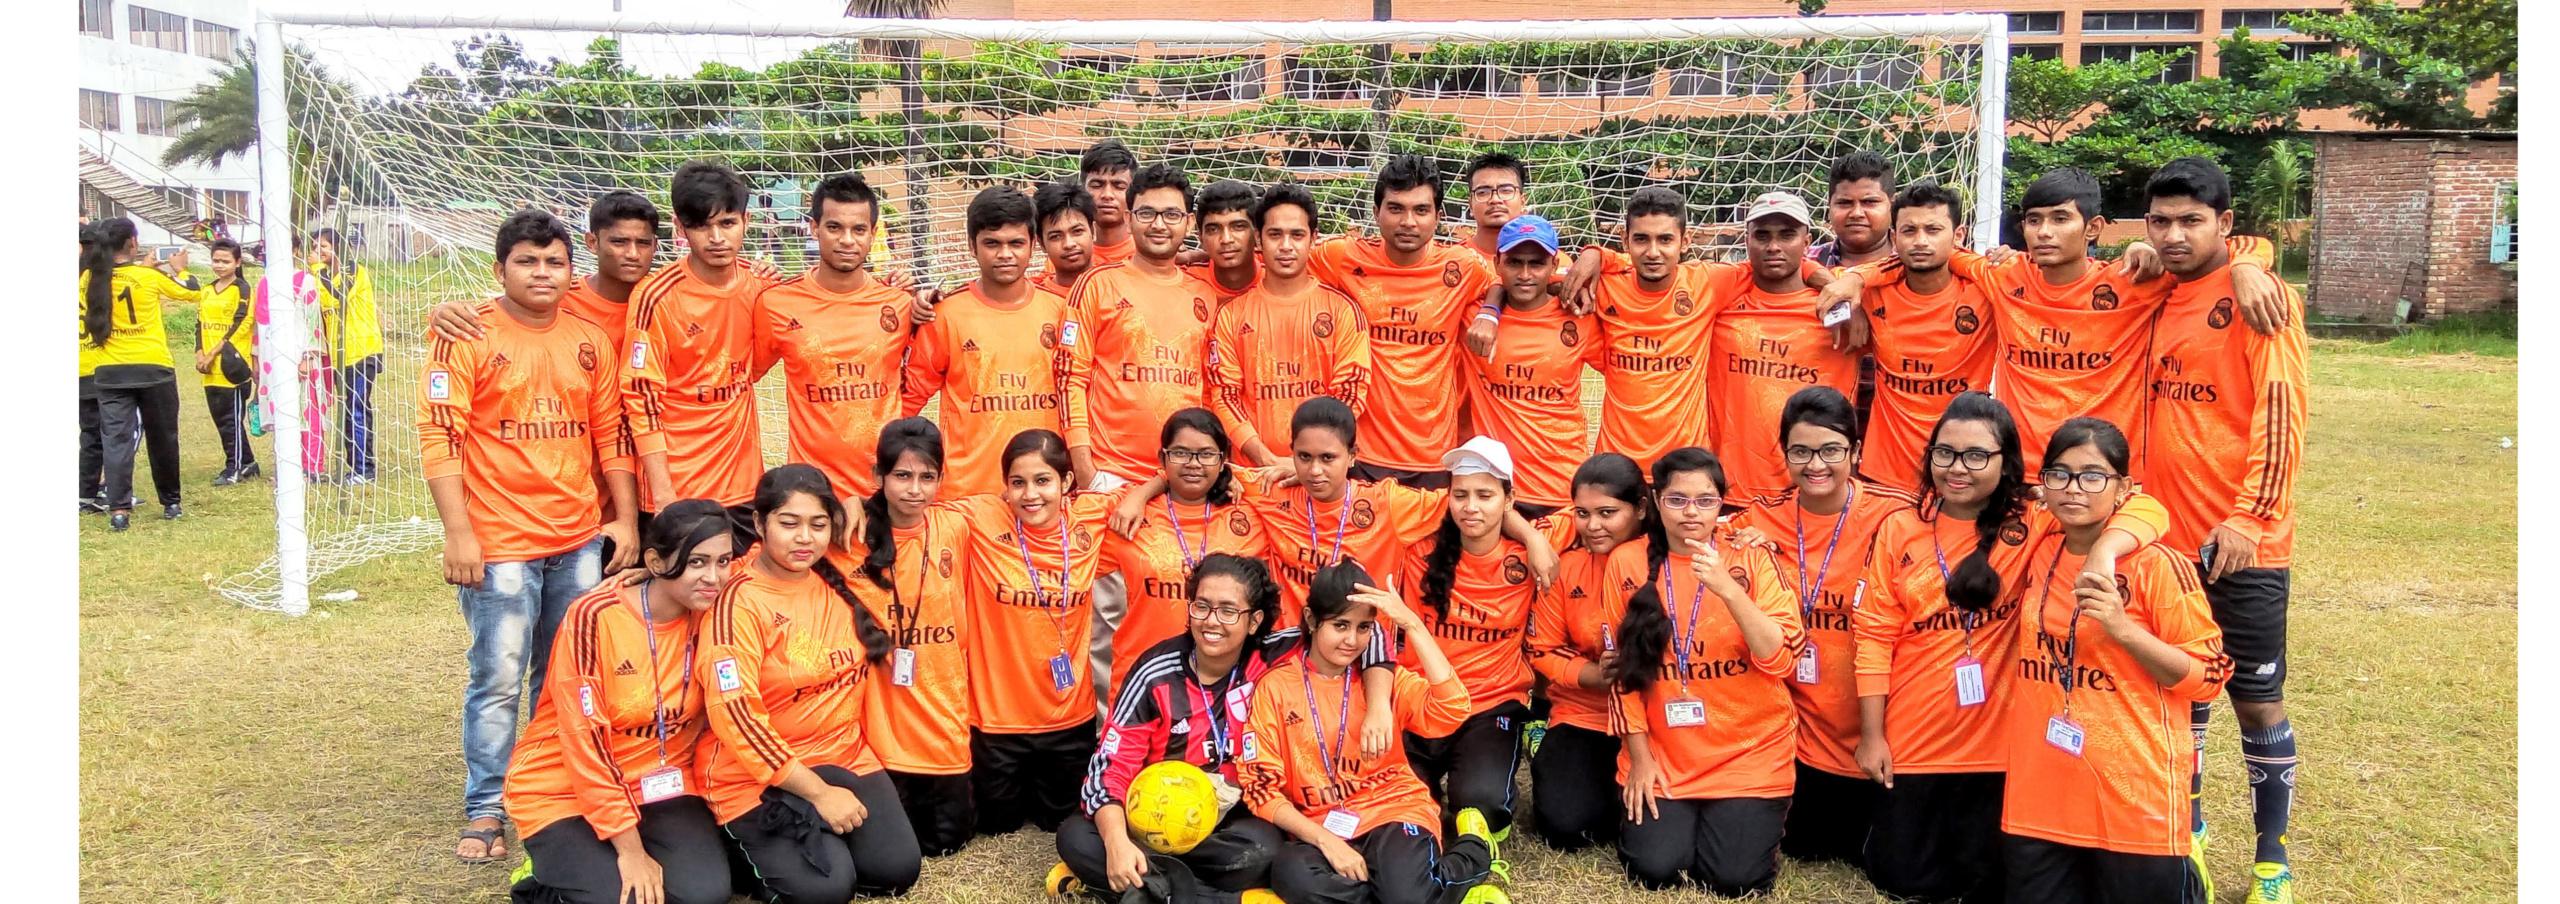 Interdepartmental Football Tournament